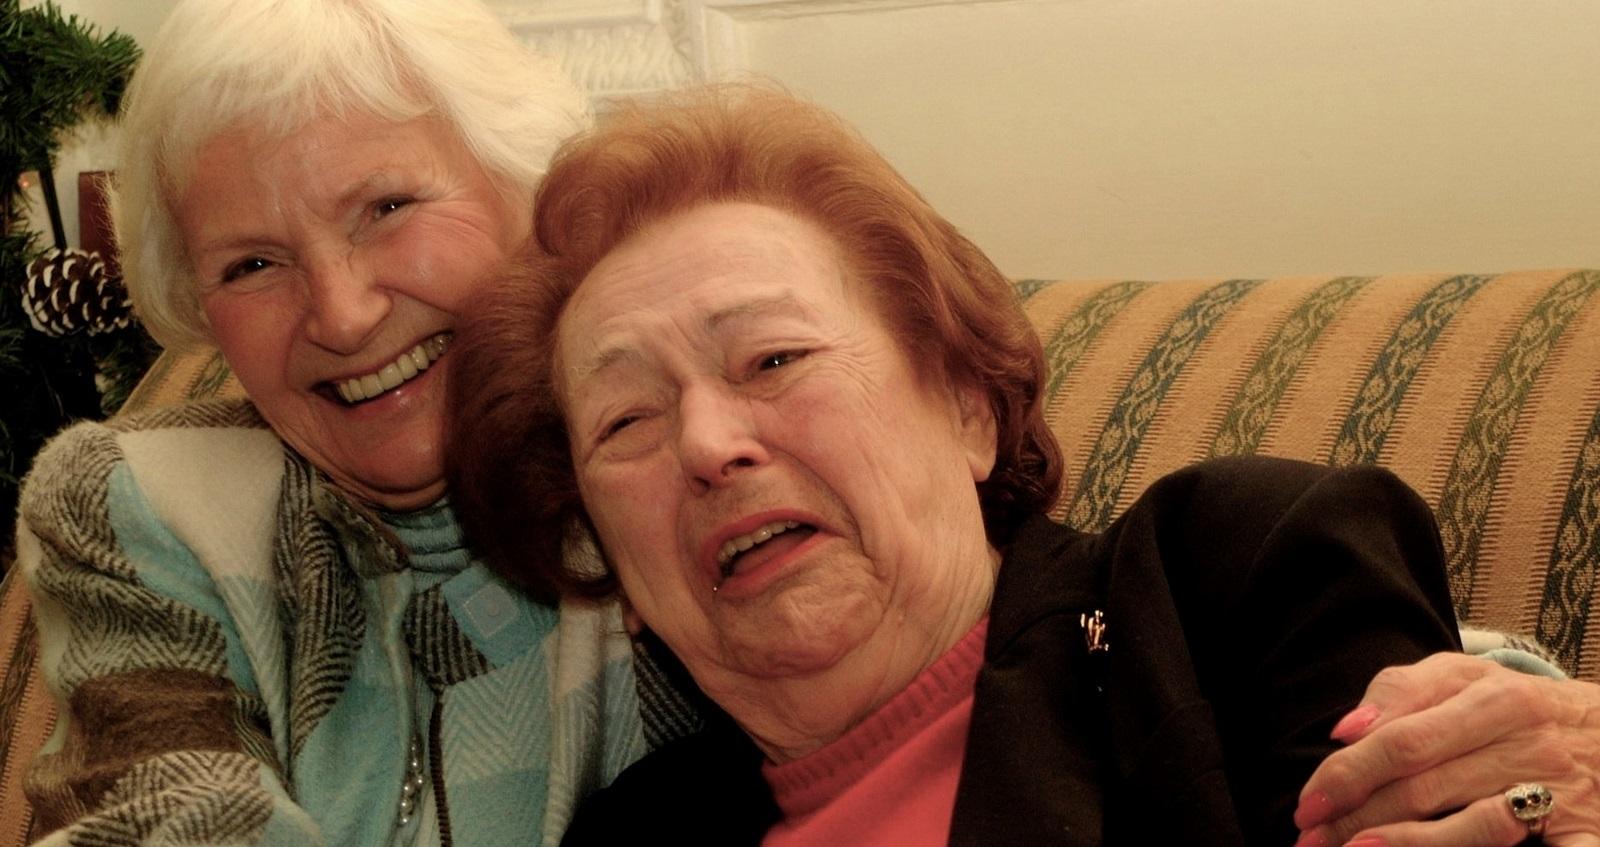 Nancy and Sonia reunited